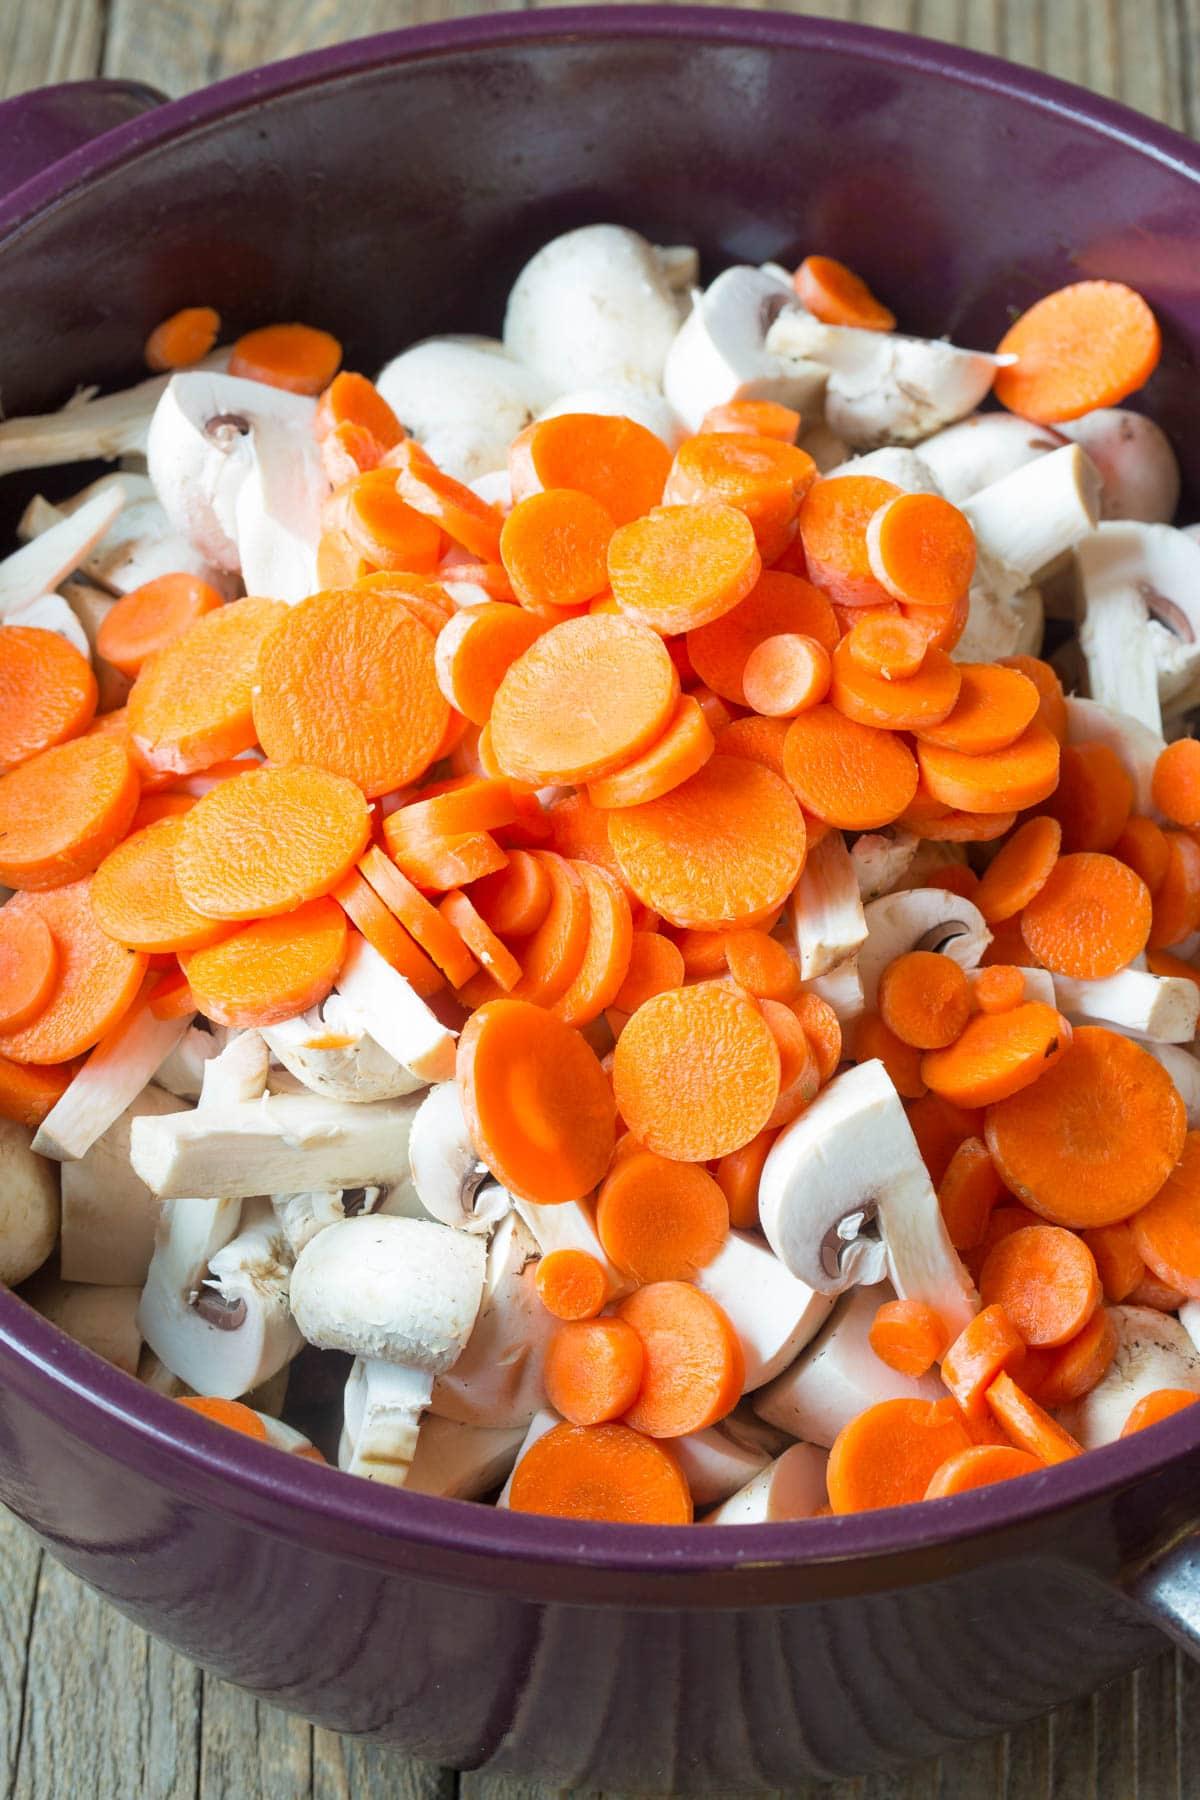 Carrots and Mushrooms #ASpicyPerspective #BeefStew #BeefStewRecipe #Stew #StewRecipe #Beef #Crockpot #InstantPot #Stovetop #BeefStewCrockpot #SlowCookerBeefStew #BestBeefStew #HowtoMakeBeefStew